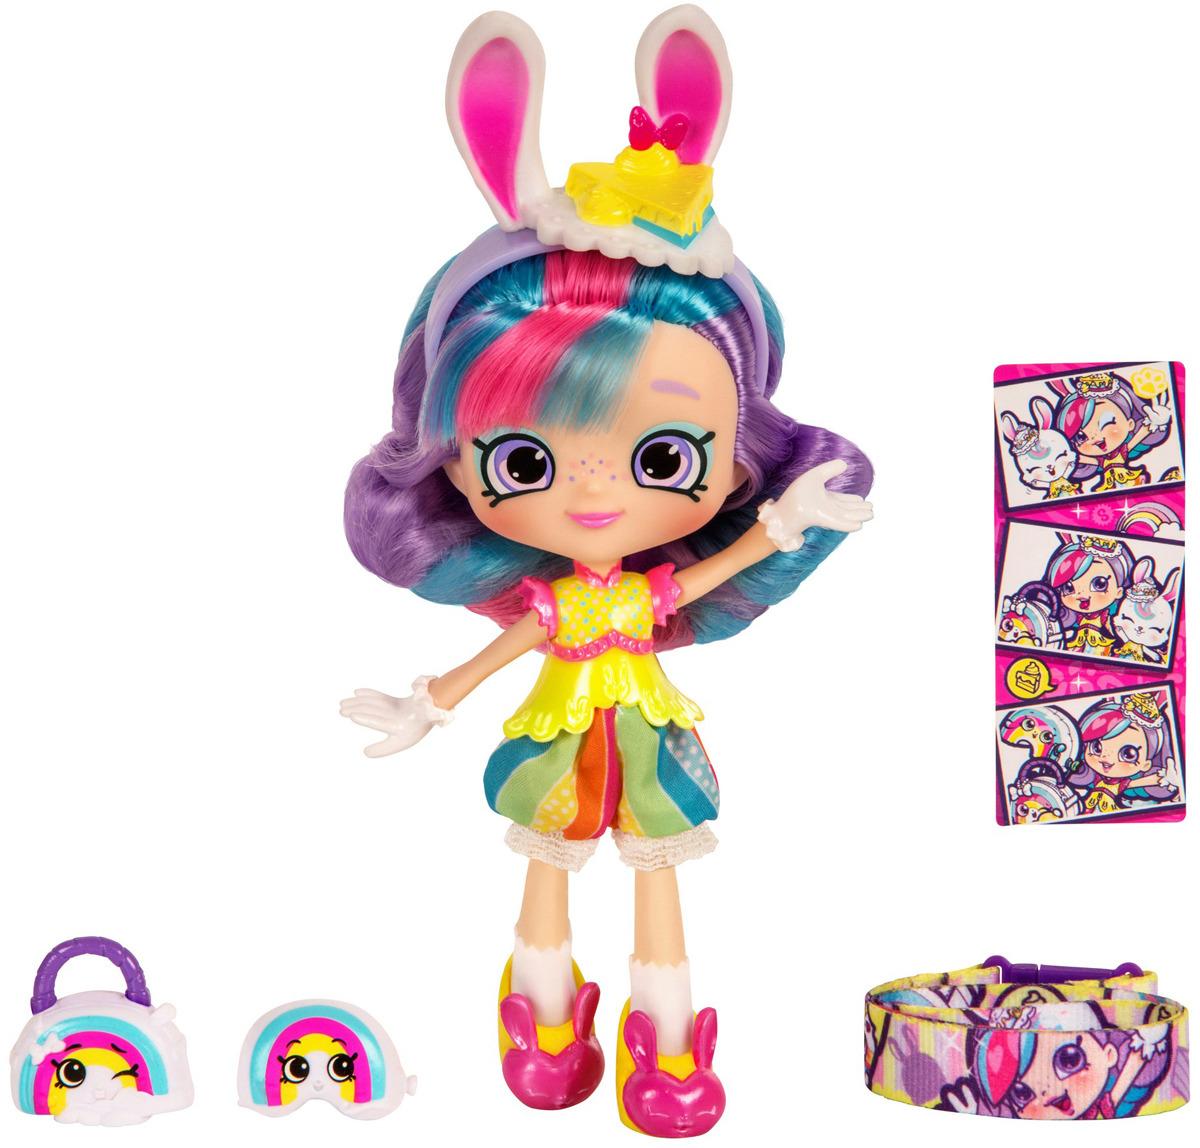 Кукла Shopkins Радужная Кэти кукла shopkins печенька коко